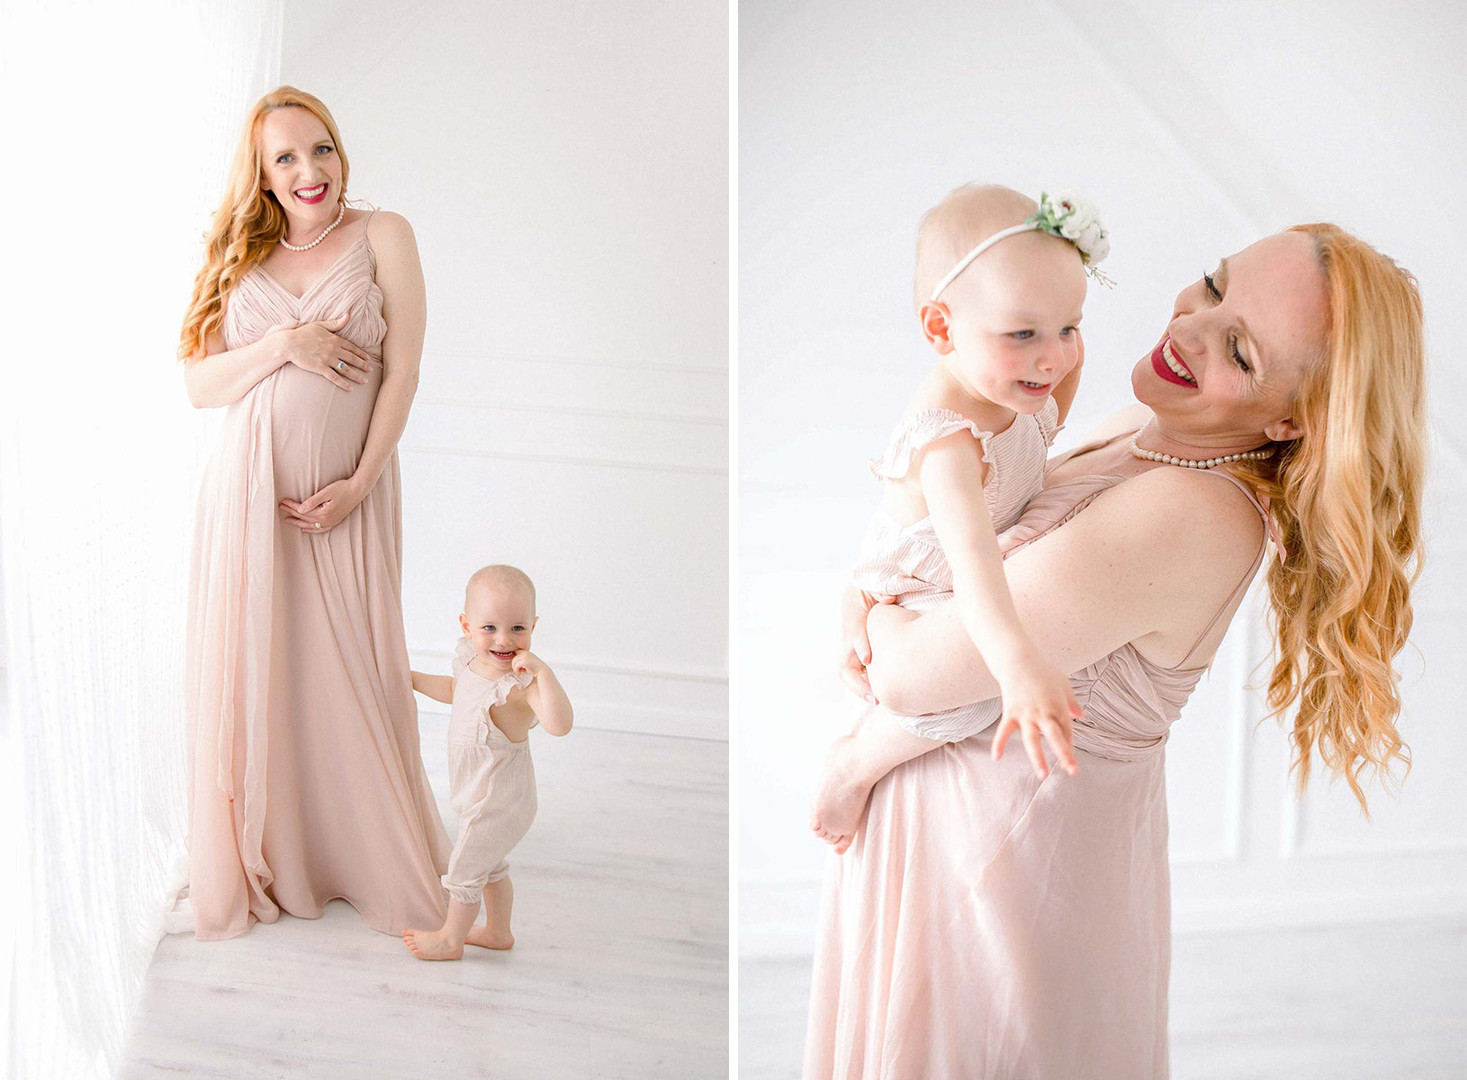 babyfotos-bielefeld-fotograf-2.jpg